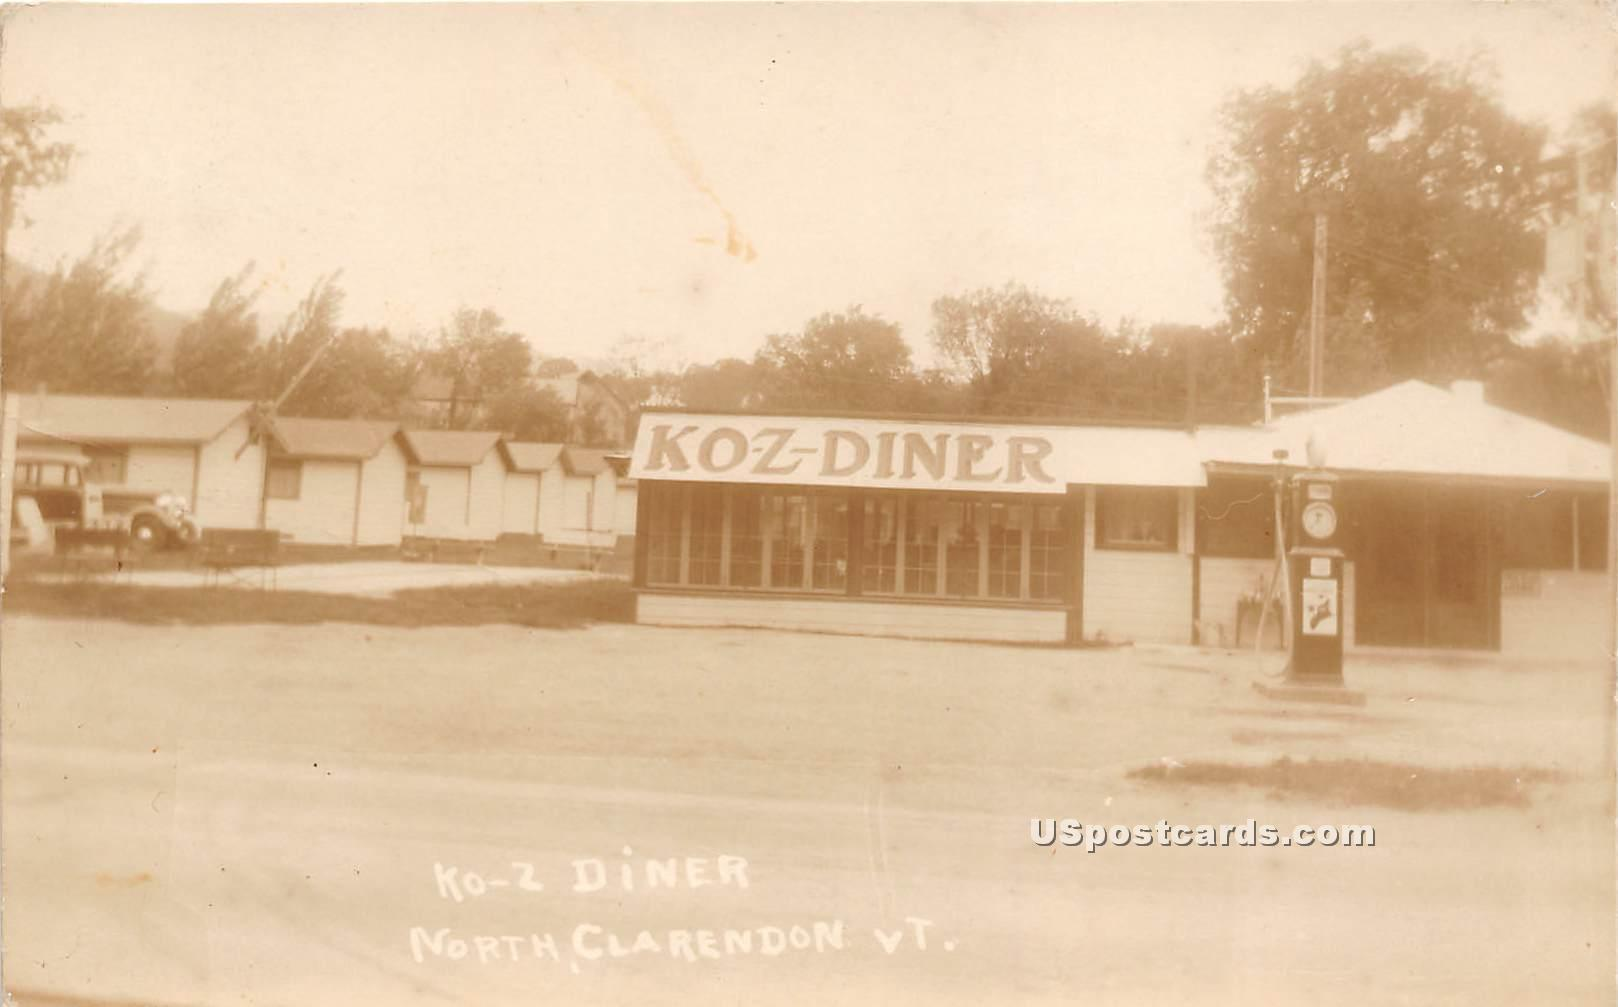 Ko-Z Diner - North Clarendon, Vermont VT Postcard